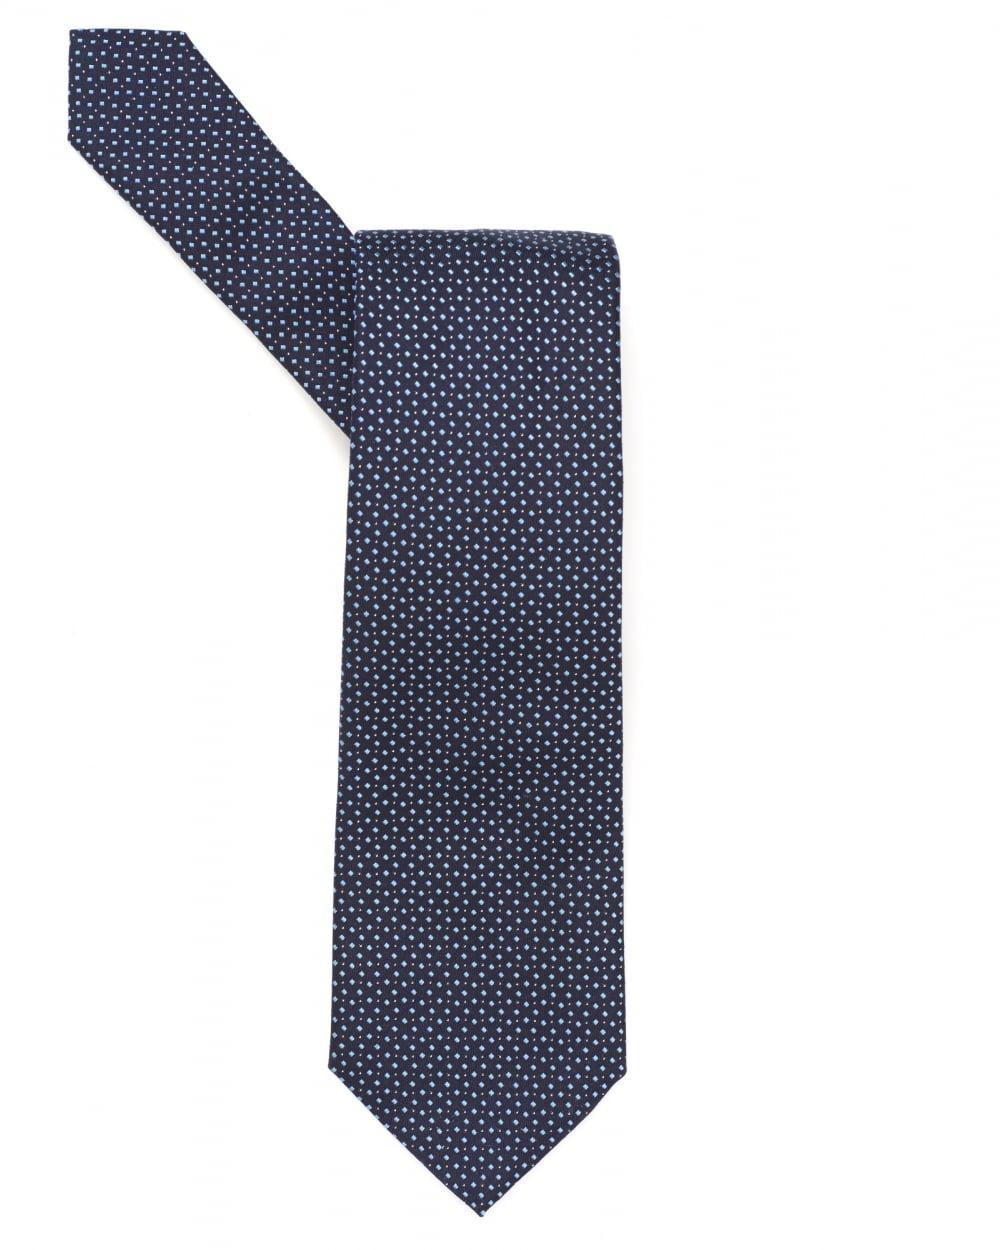 b66a7c036394 Hugo Boss Classic Mens Tie, Slatted Geometric Navy Sky Silk Tie